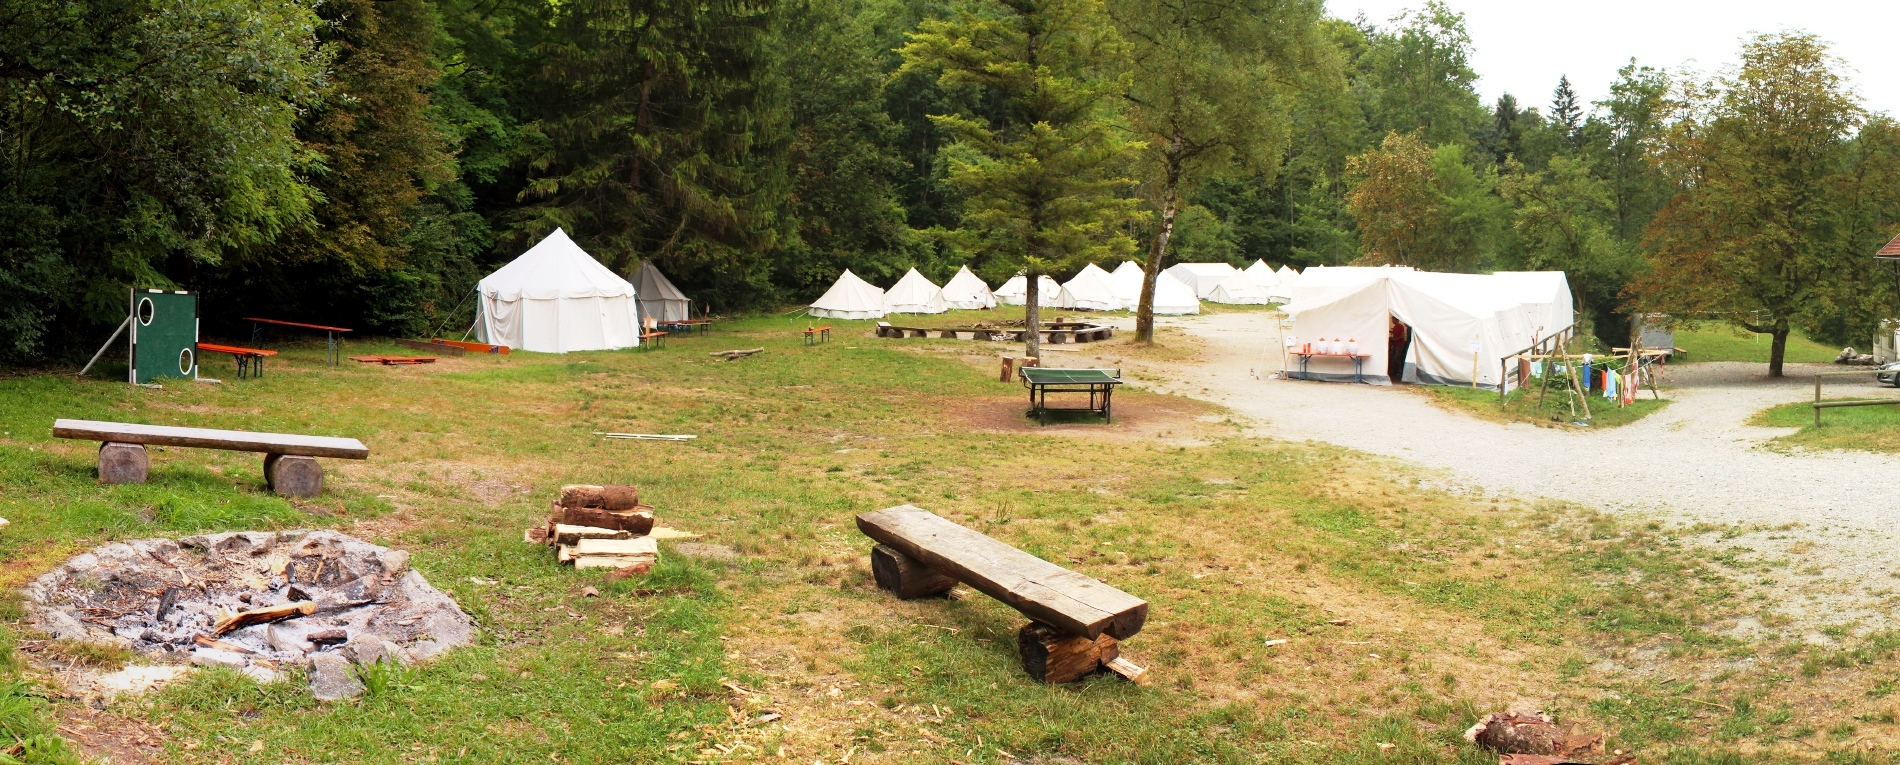 Lust auf Zeltlager?